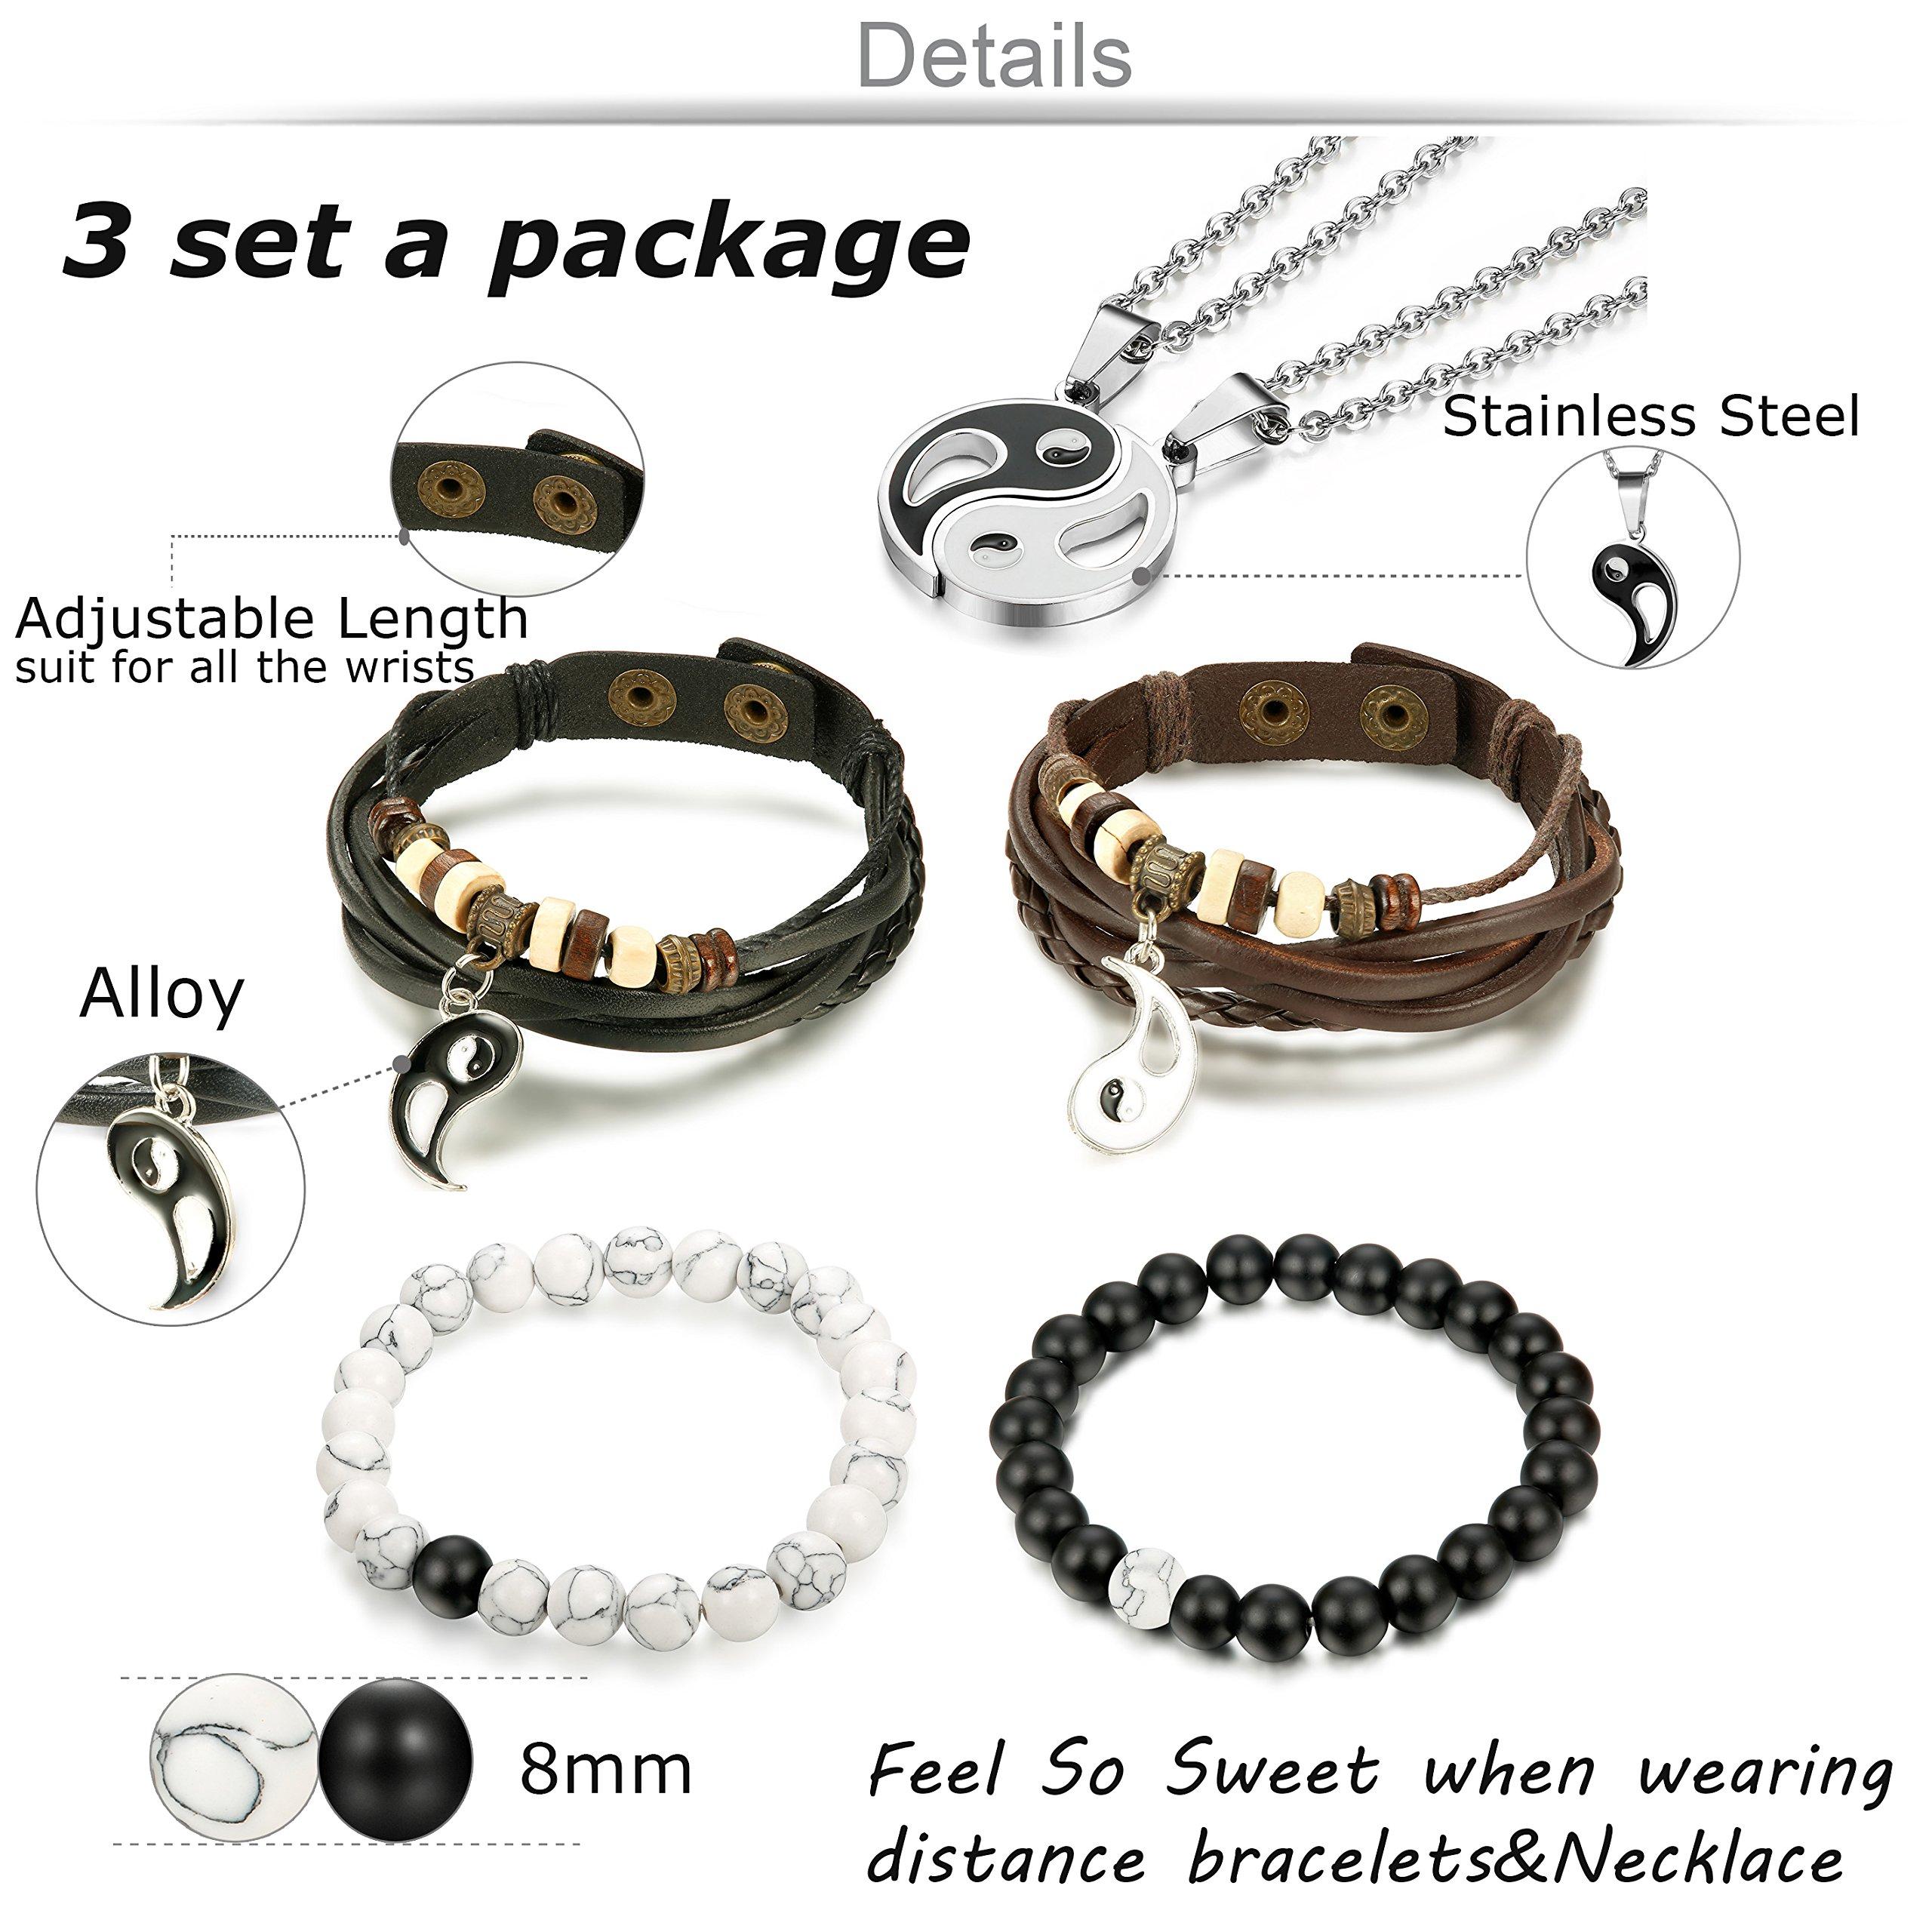 Jstyle Yin Yang Couples Necklace Bracelets for Women Mens Distance Leather Beaded Bracelet Adjustable 3Sets by Jstyle (Image #2)